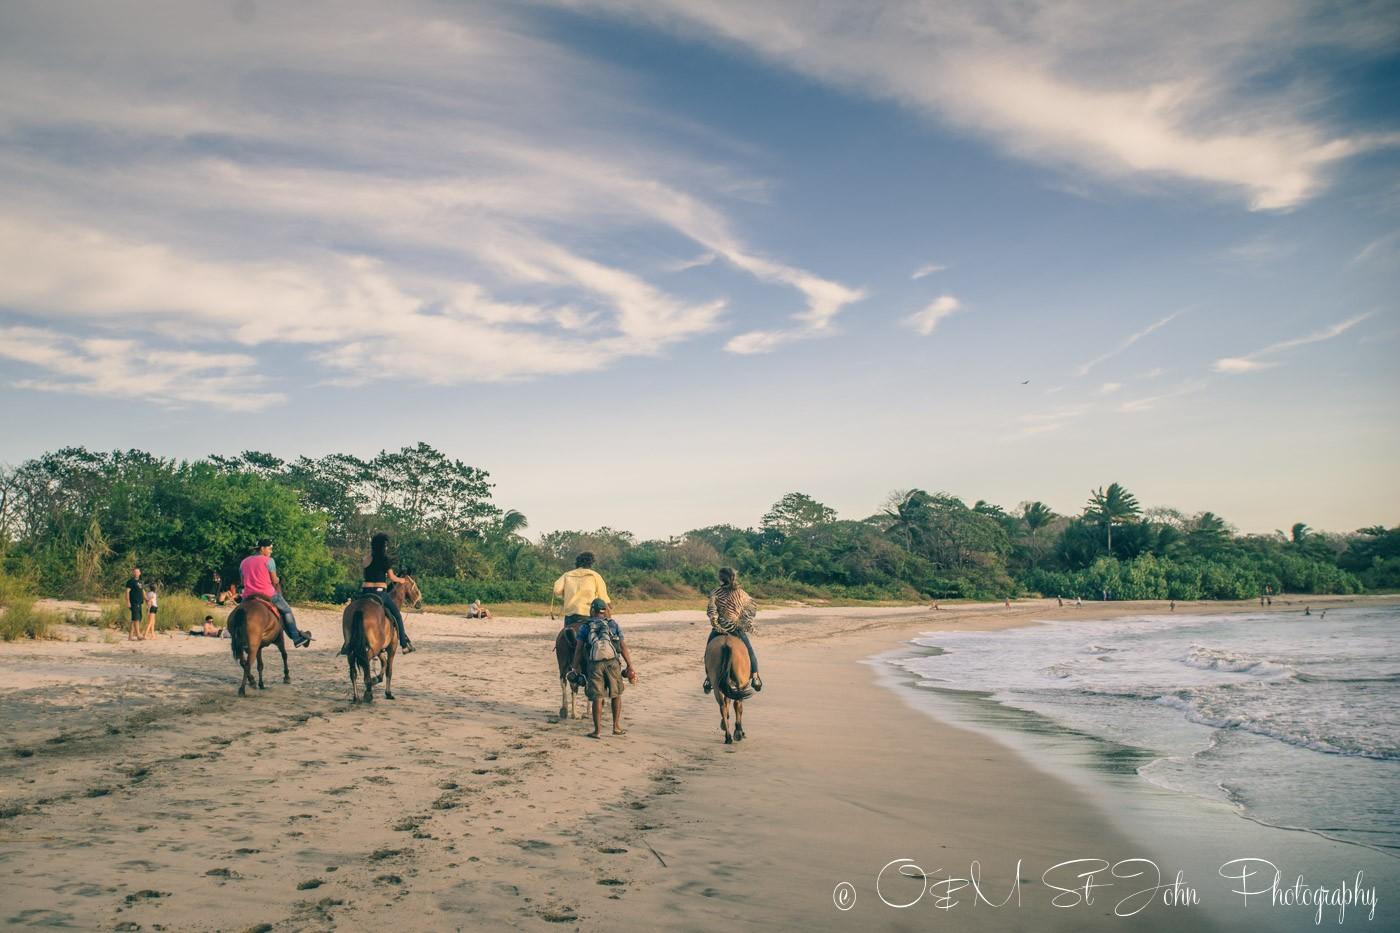 Activities to do in Costa Rica